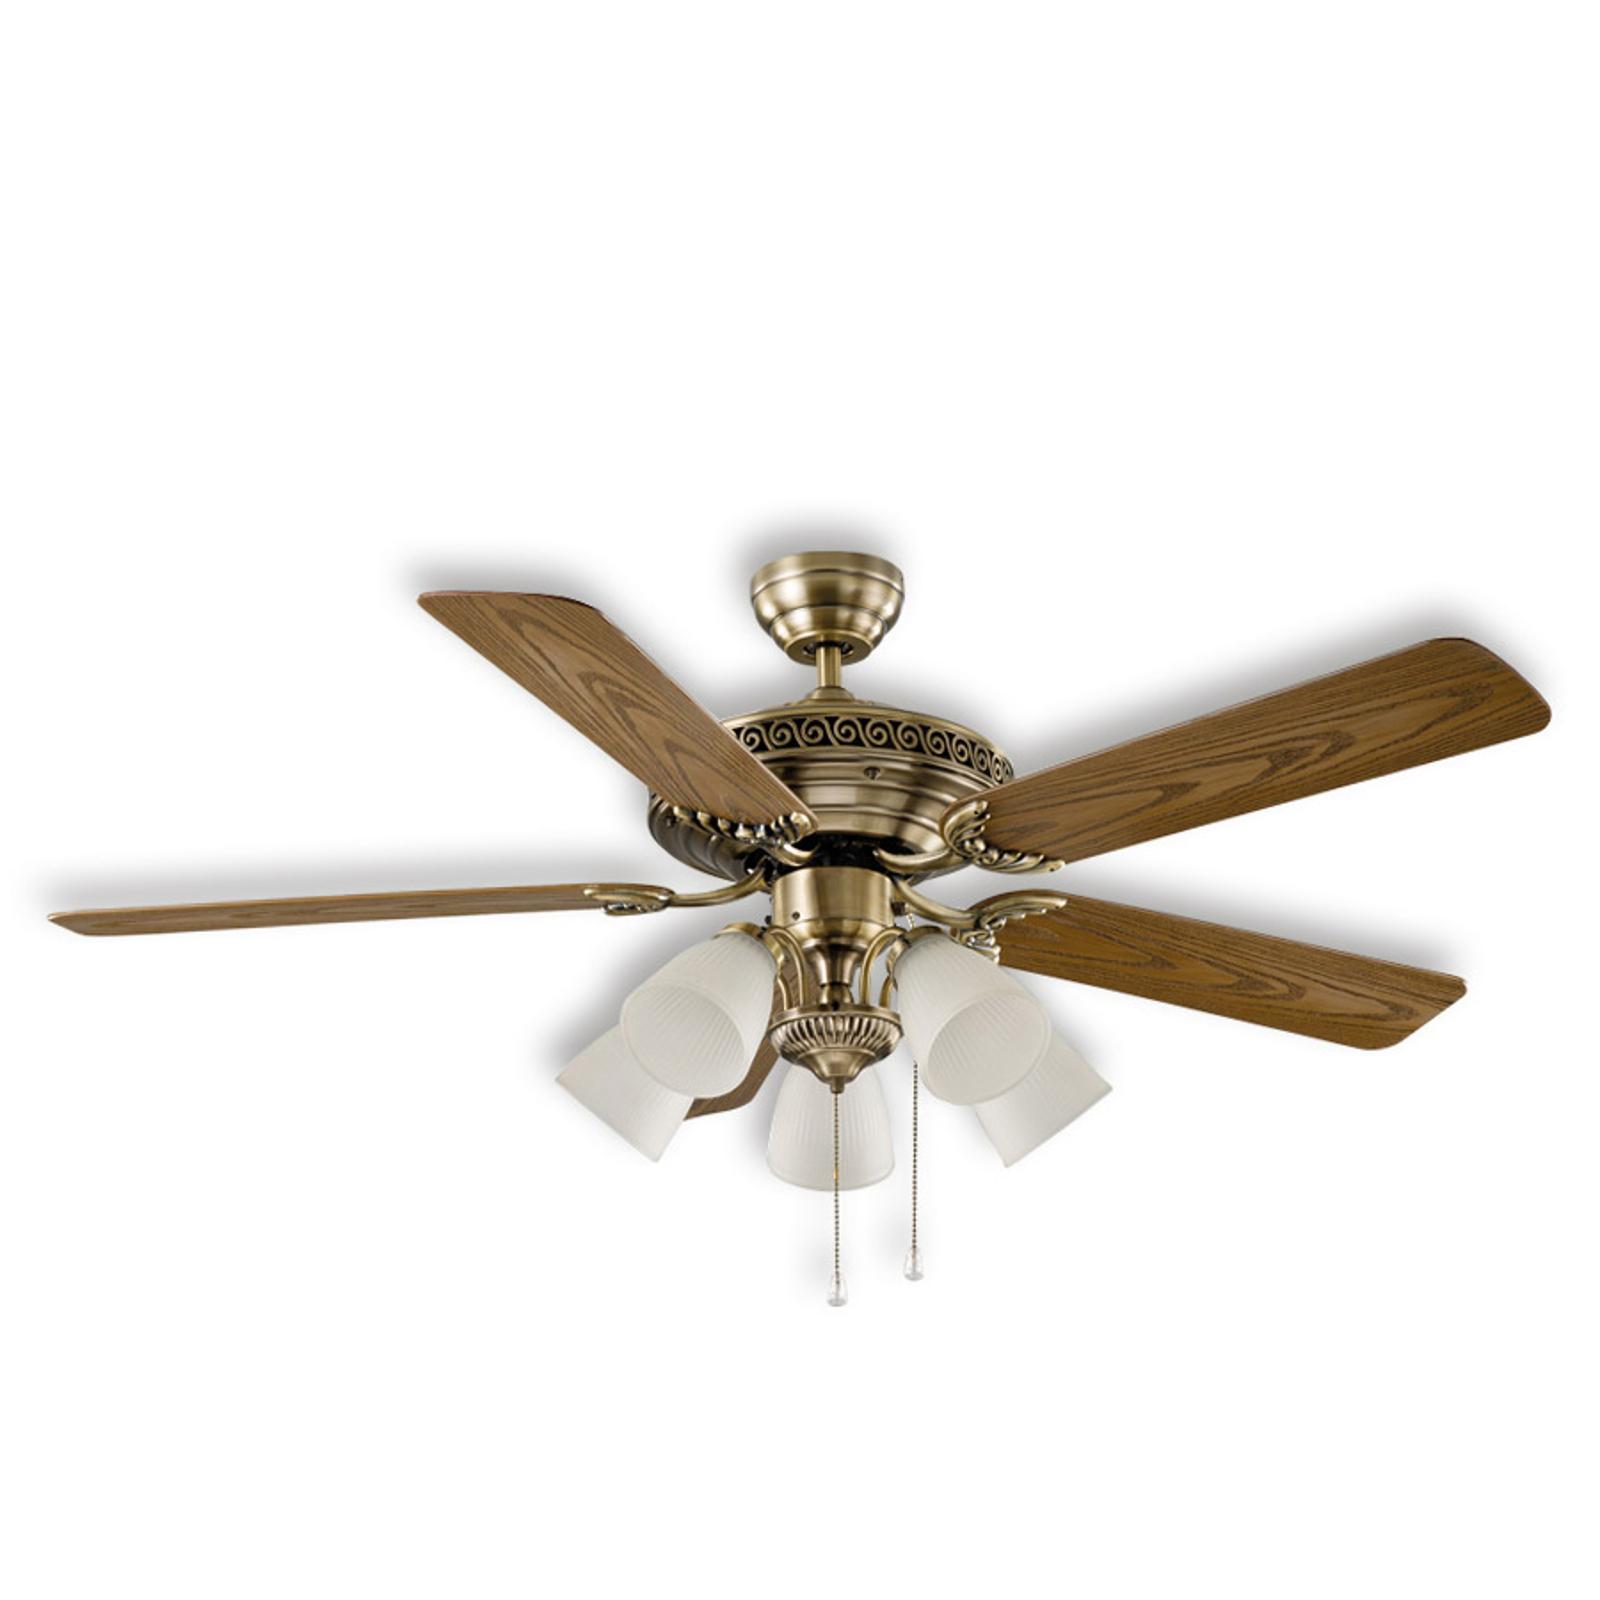 Centurion ceiling fan, antique brass_2015057_1